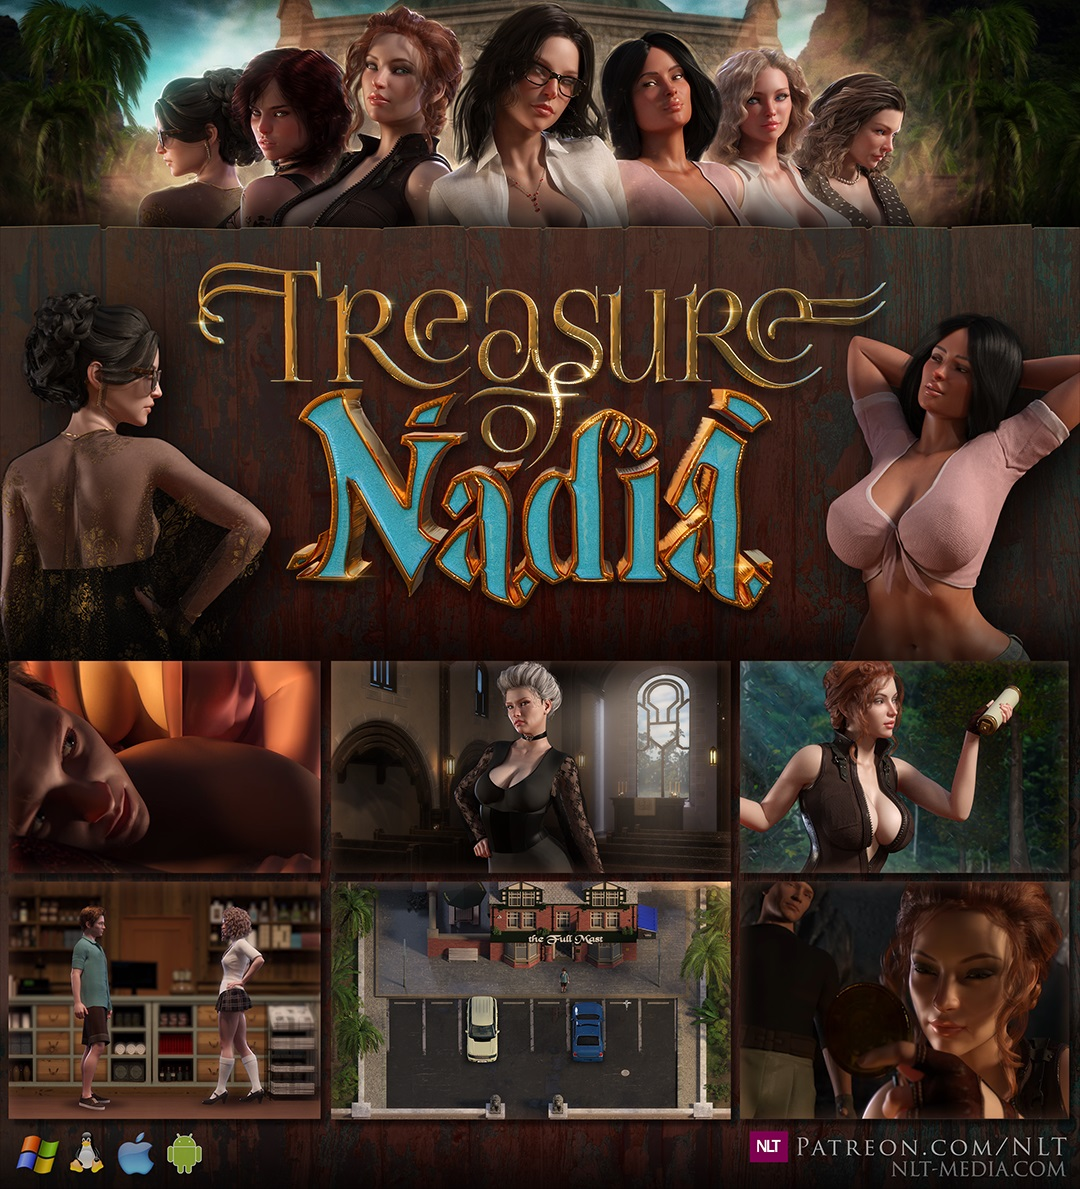 Treasure of Nadia adult game